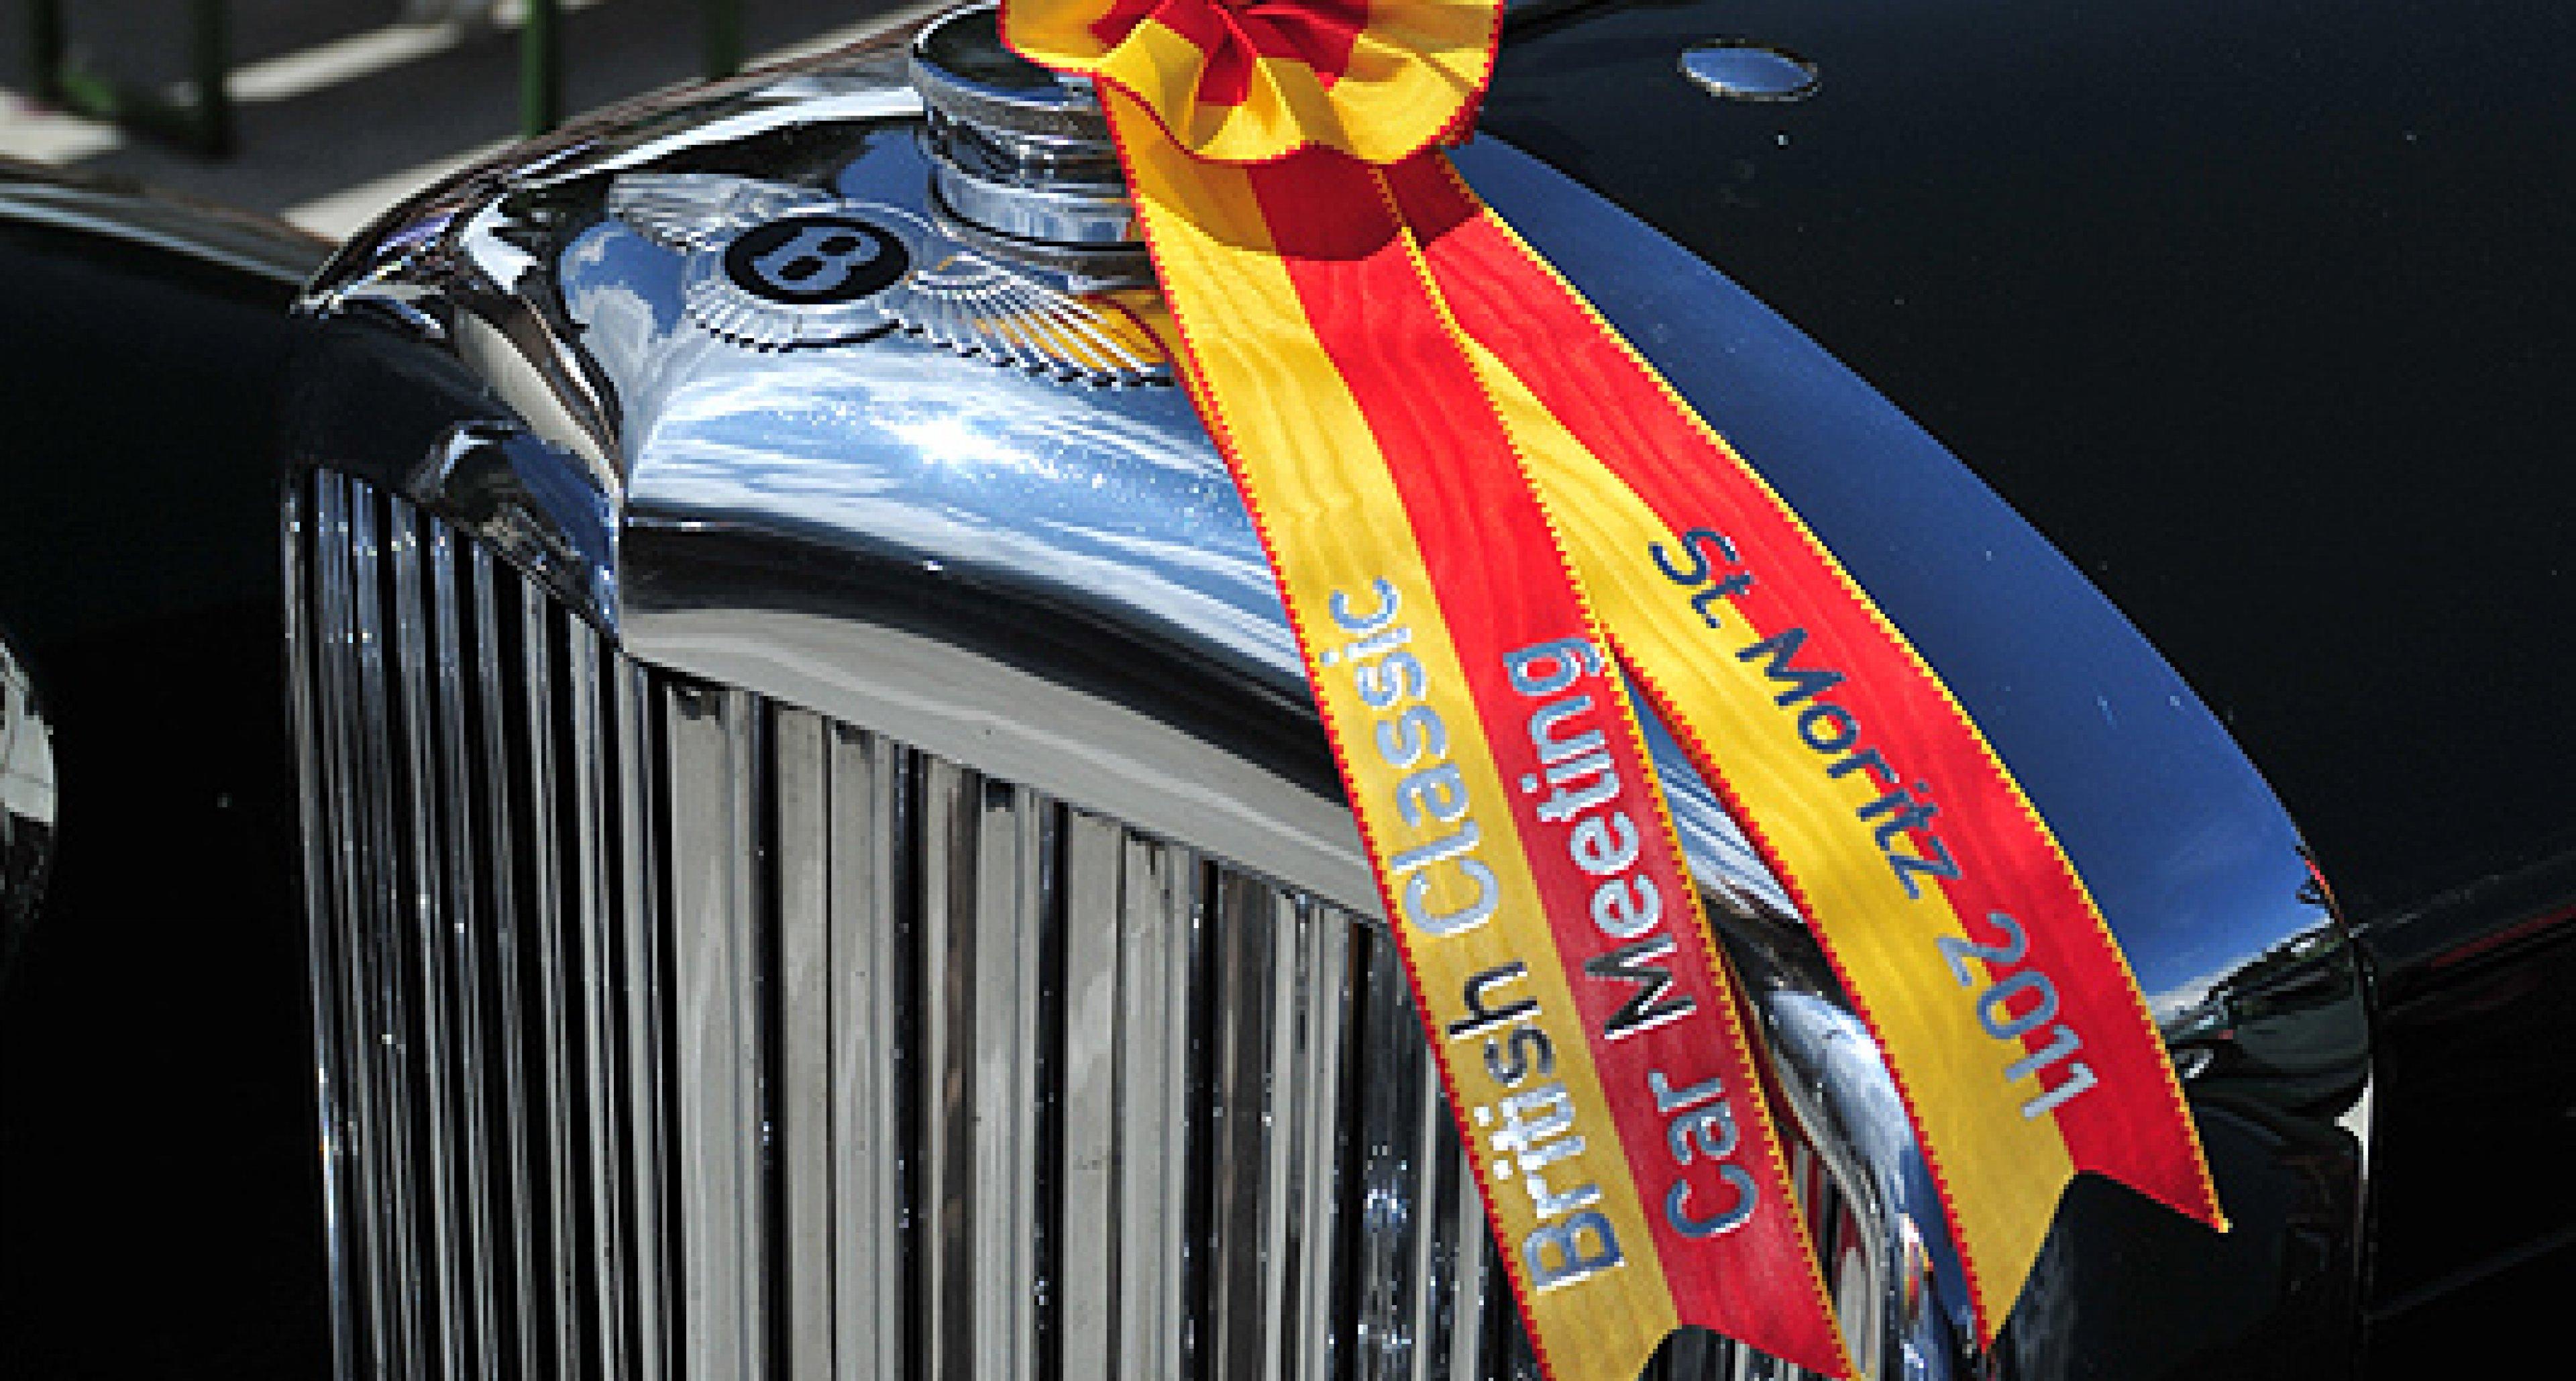 2011, 18th St Moritz British Classic Car Meeting: Review